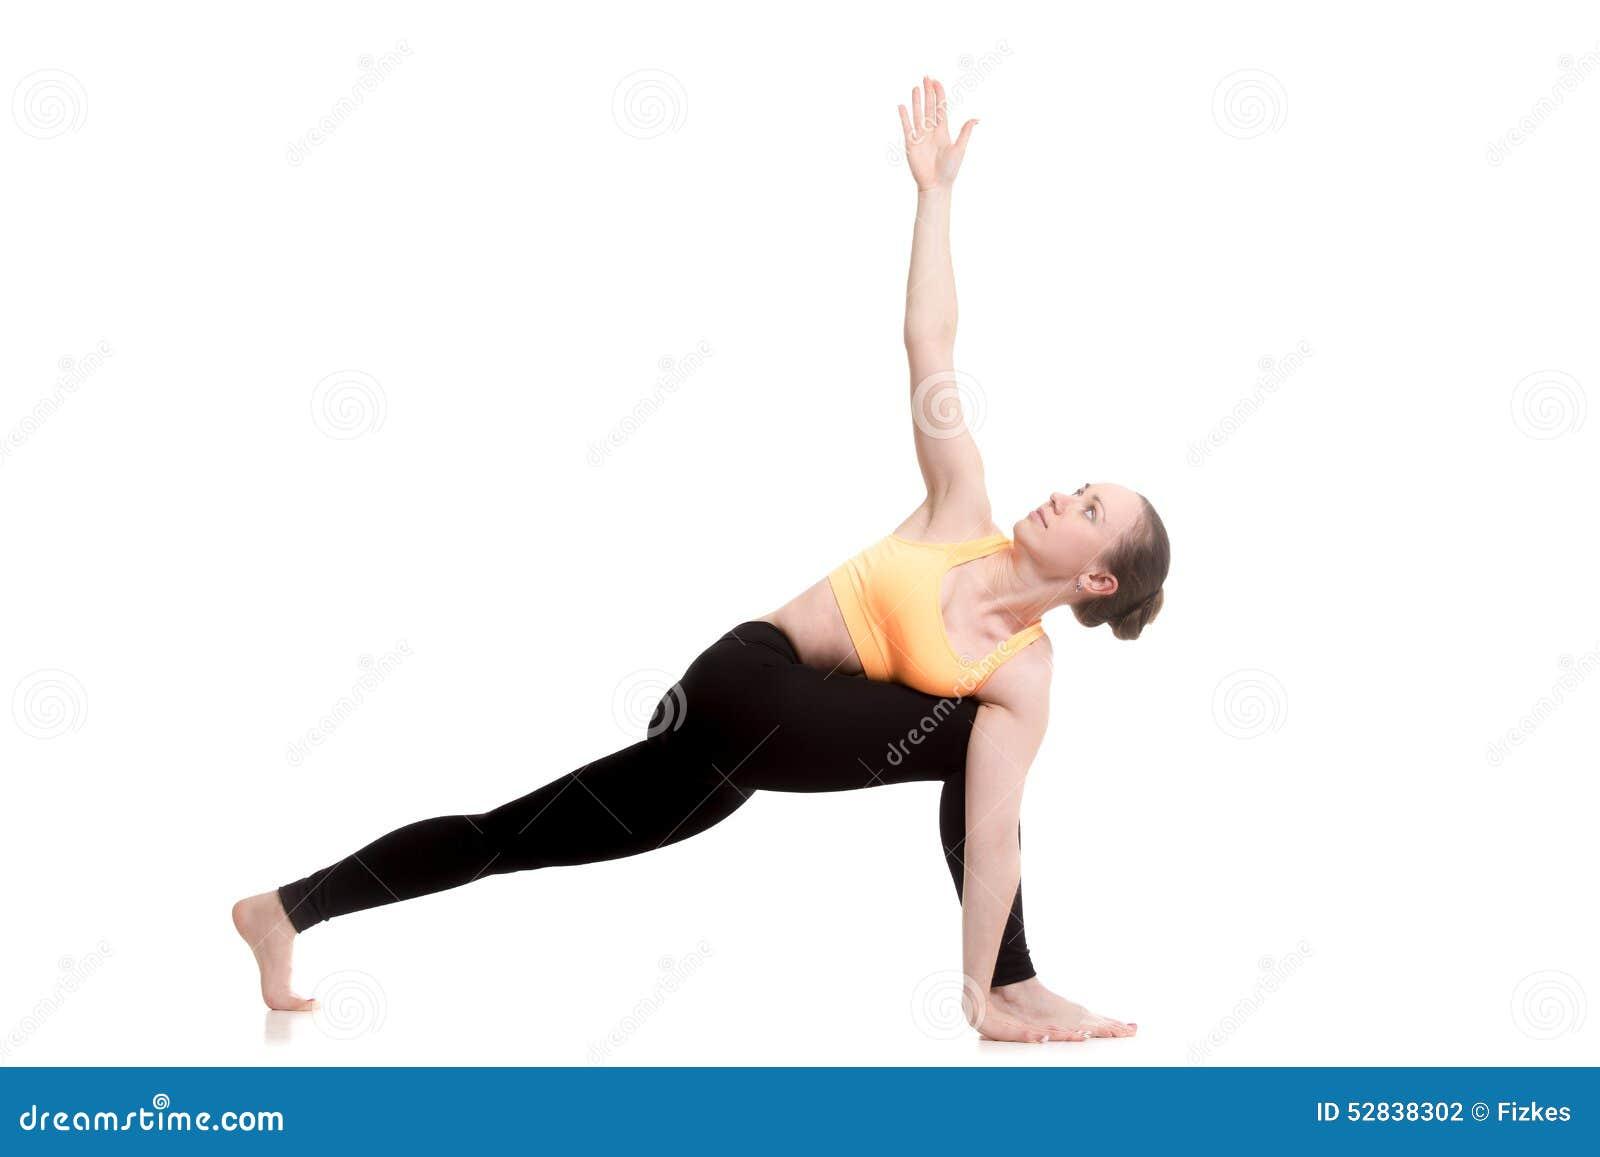 revolved side angle yoga pose stock photo image 52838302